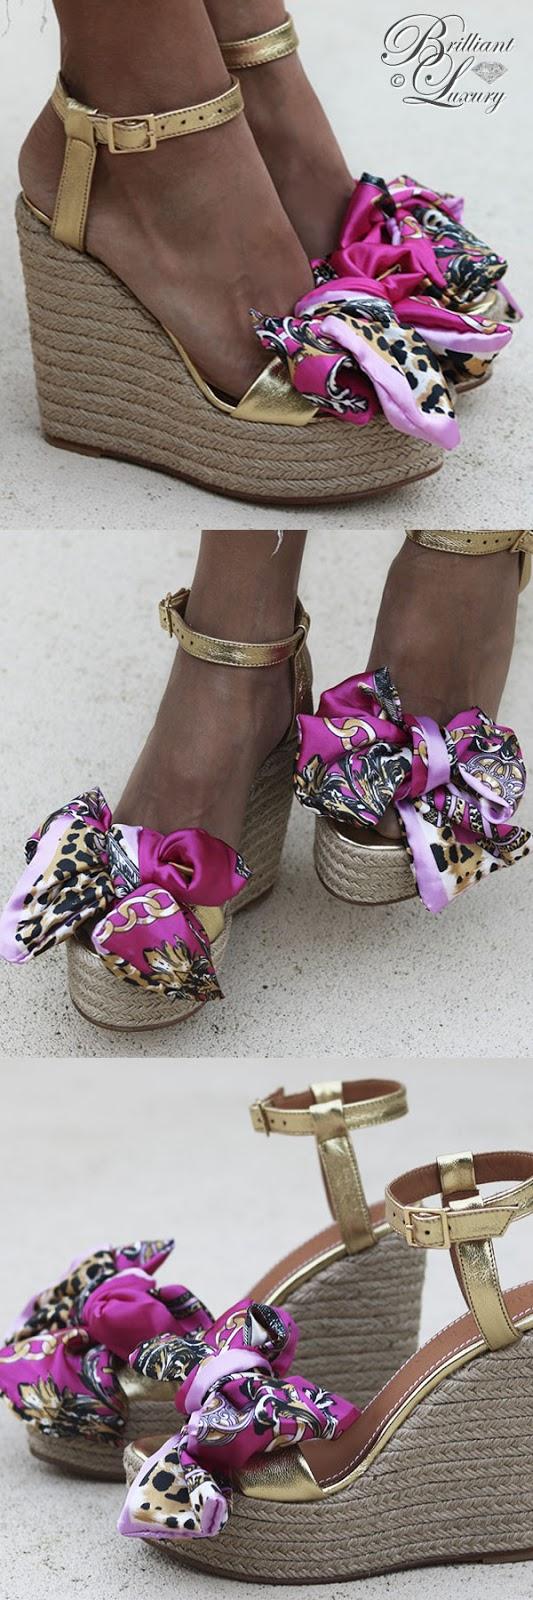 Brilliant Luxury ♦ Alameda Turquesa Pink Paradise bow weges